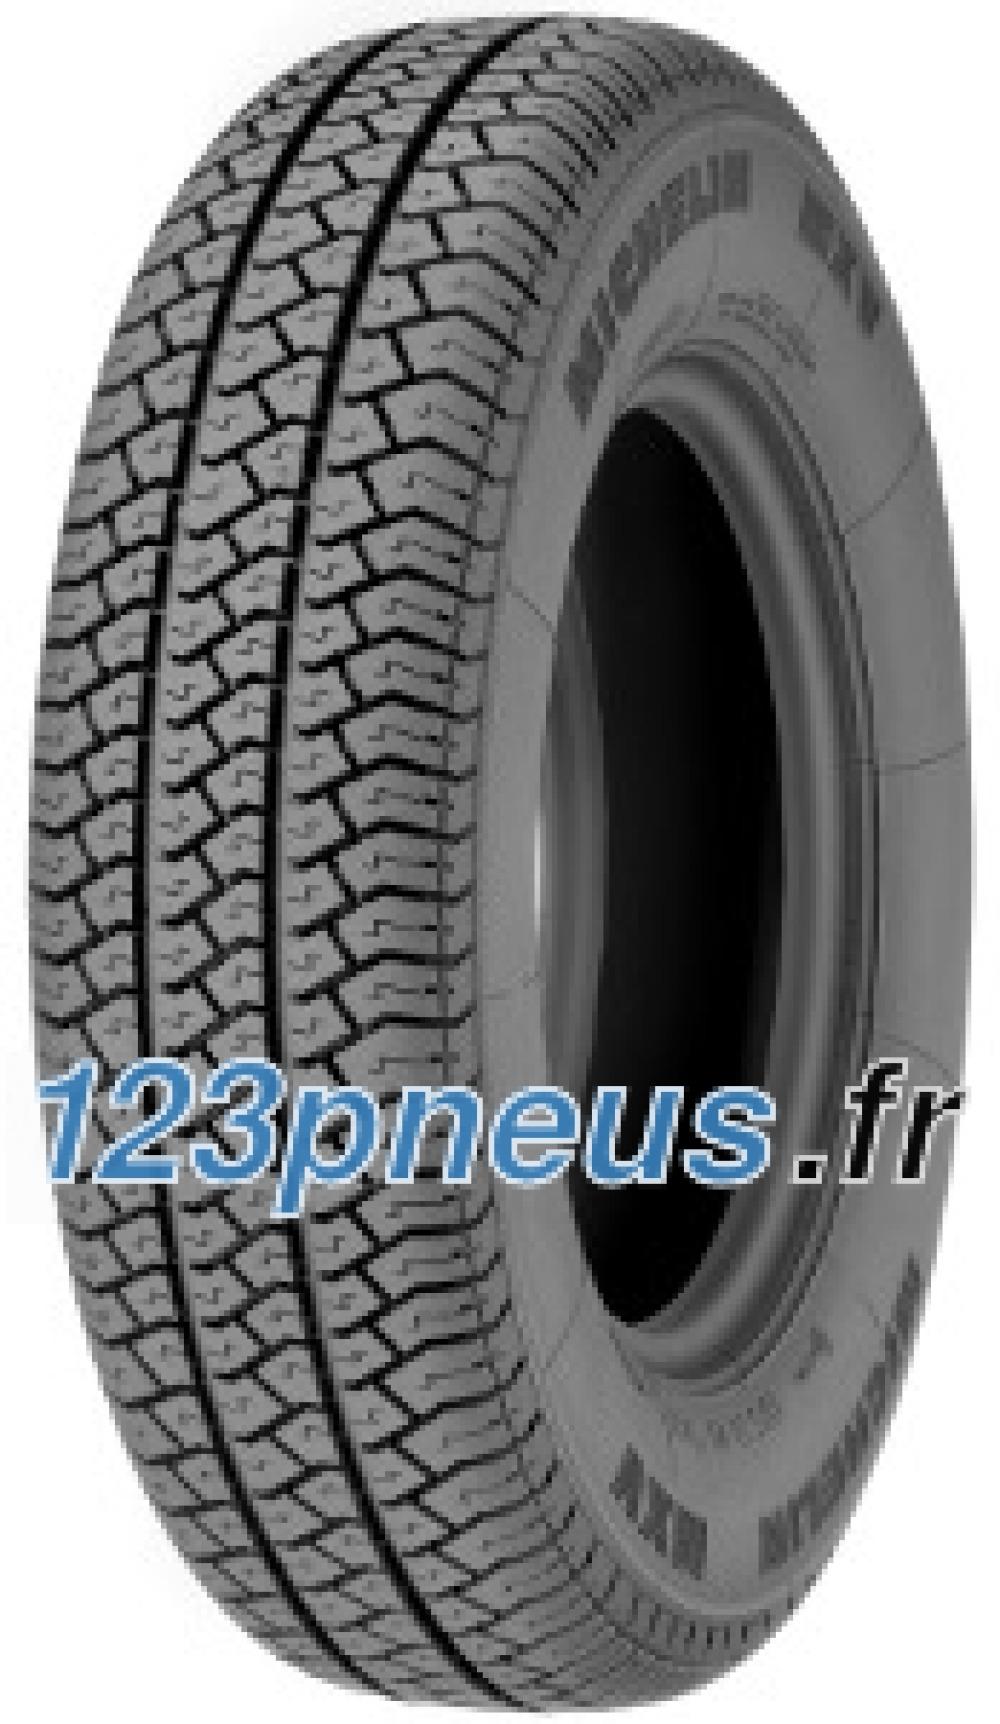 Michelin MXV P